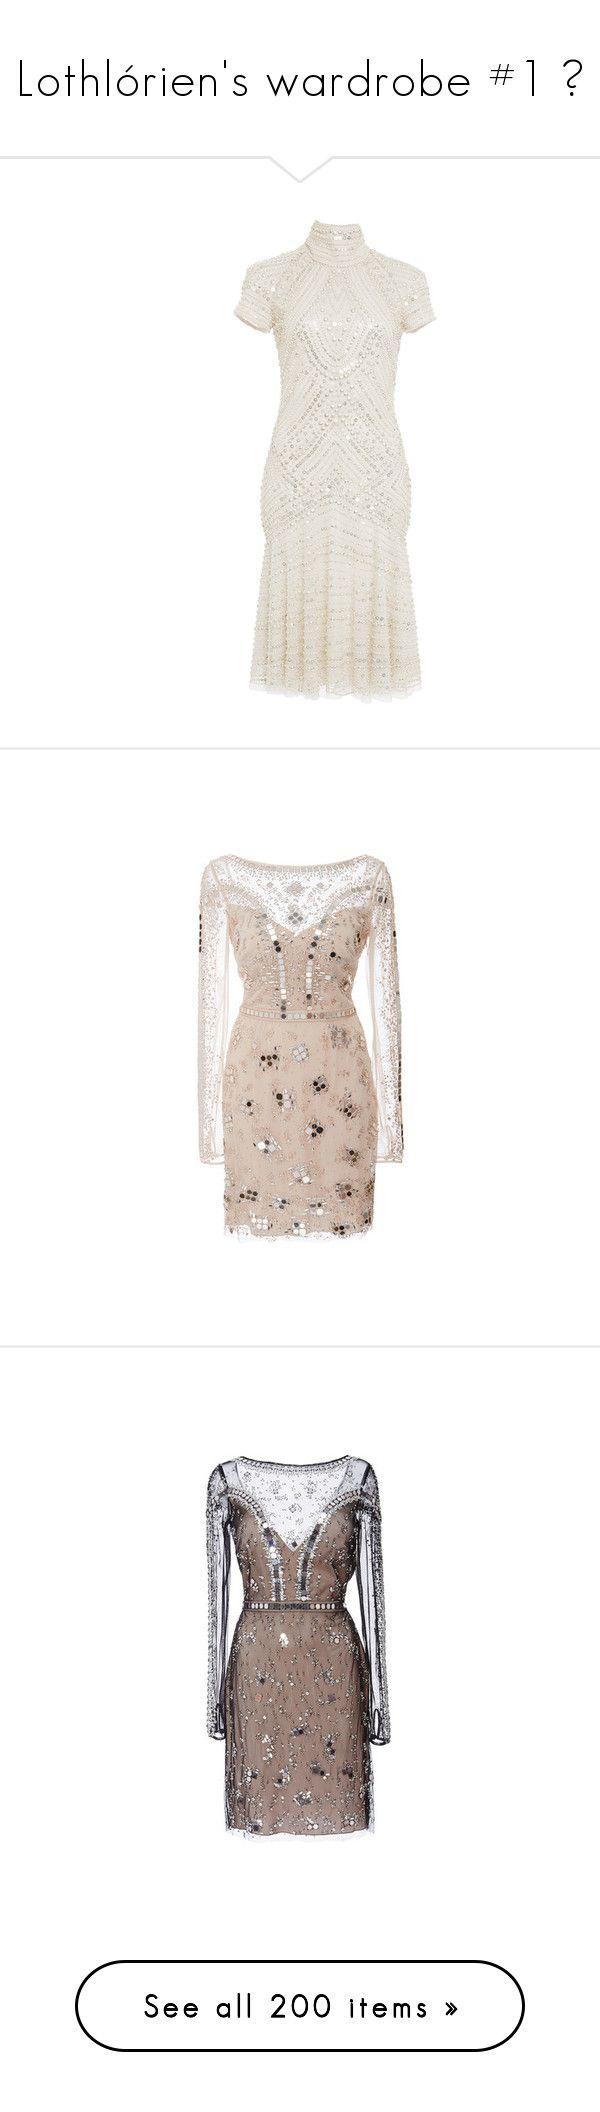 """Lothlórien's wardrobe #1 ❧"" by infinikey ❤ liked on Polyvore featuring middleearth, tolkien, elve, dresses, naeem khan, metallic mini dress, white beaded cocktail dress, fit and flare dress, white fit and flare dress and mini dress"